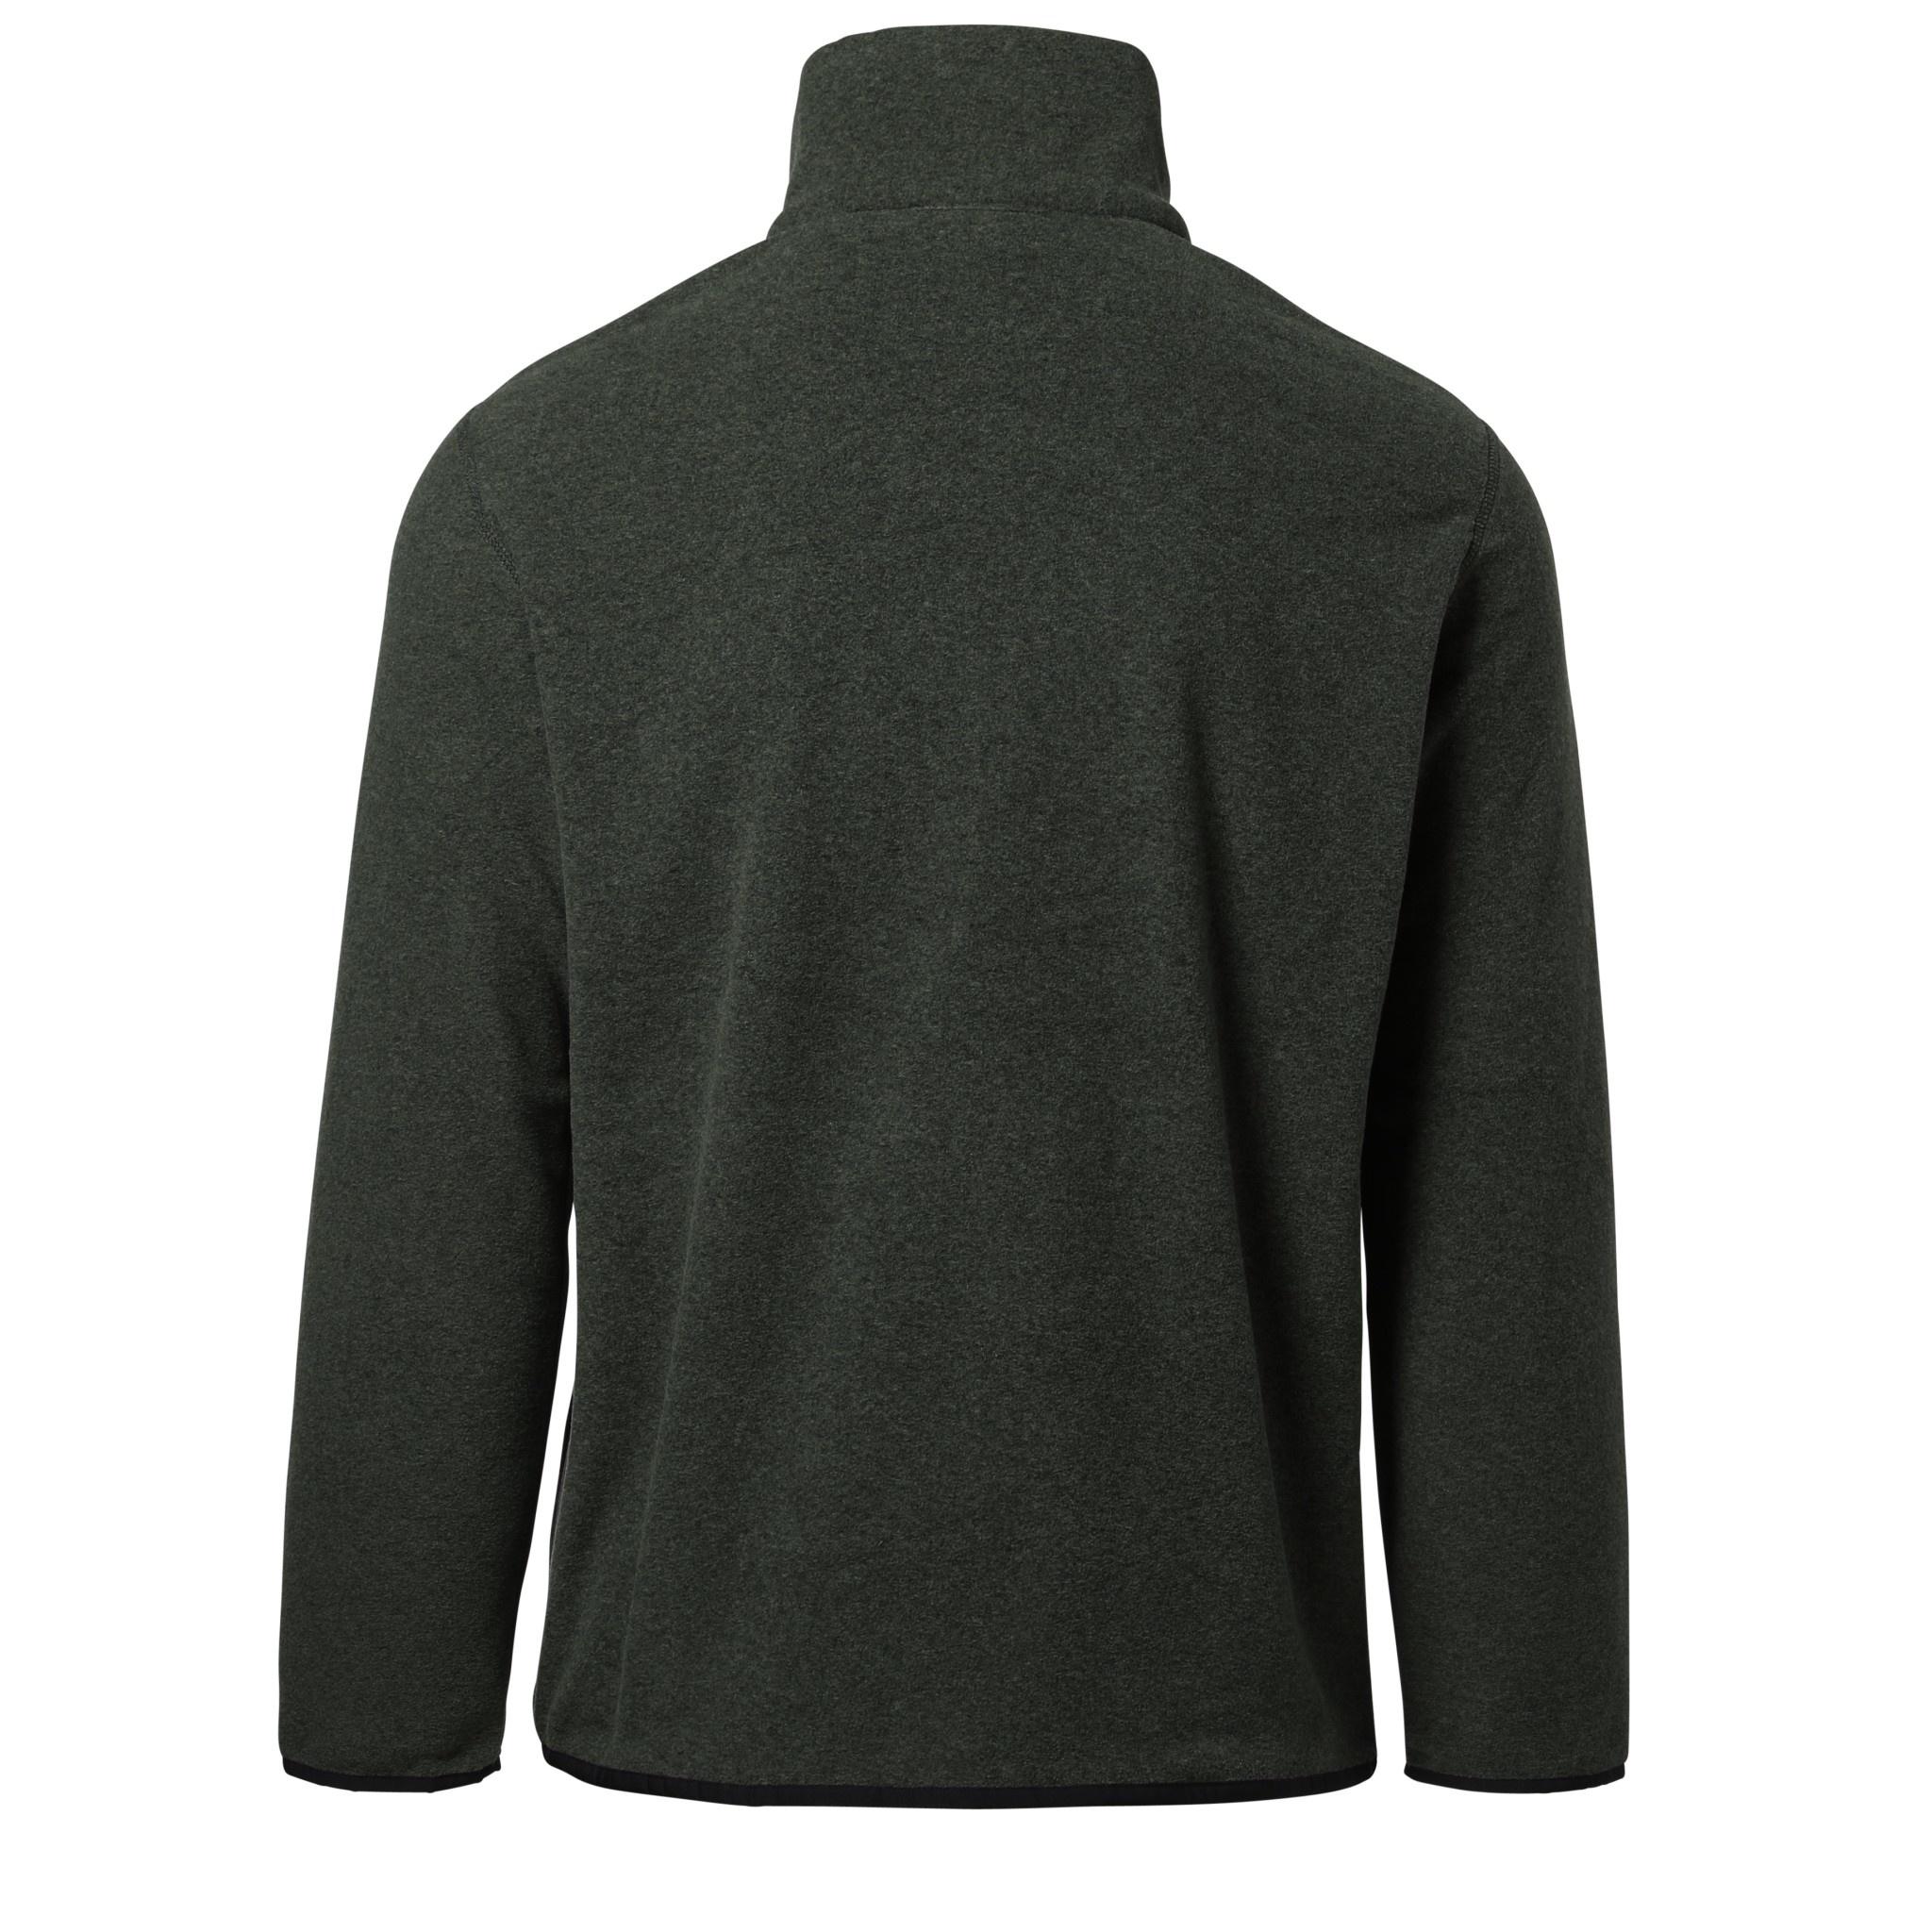 Cotopaxi M's Teca Fleece Jacket-4